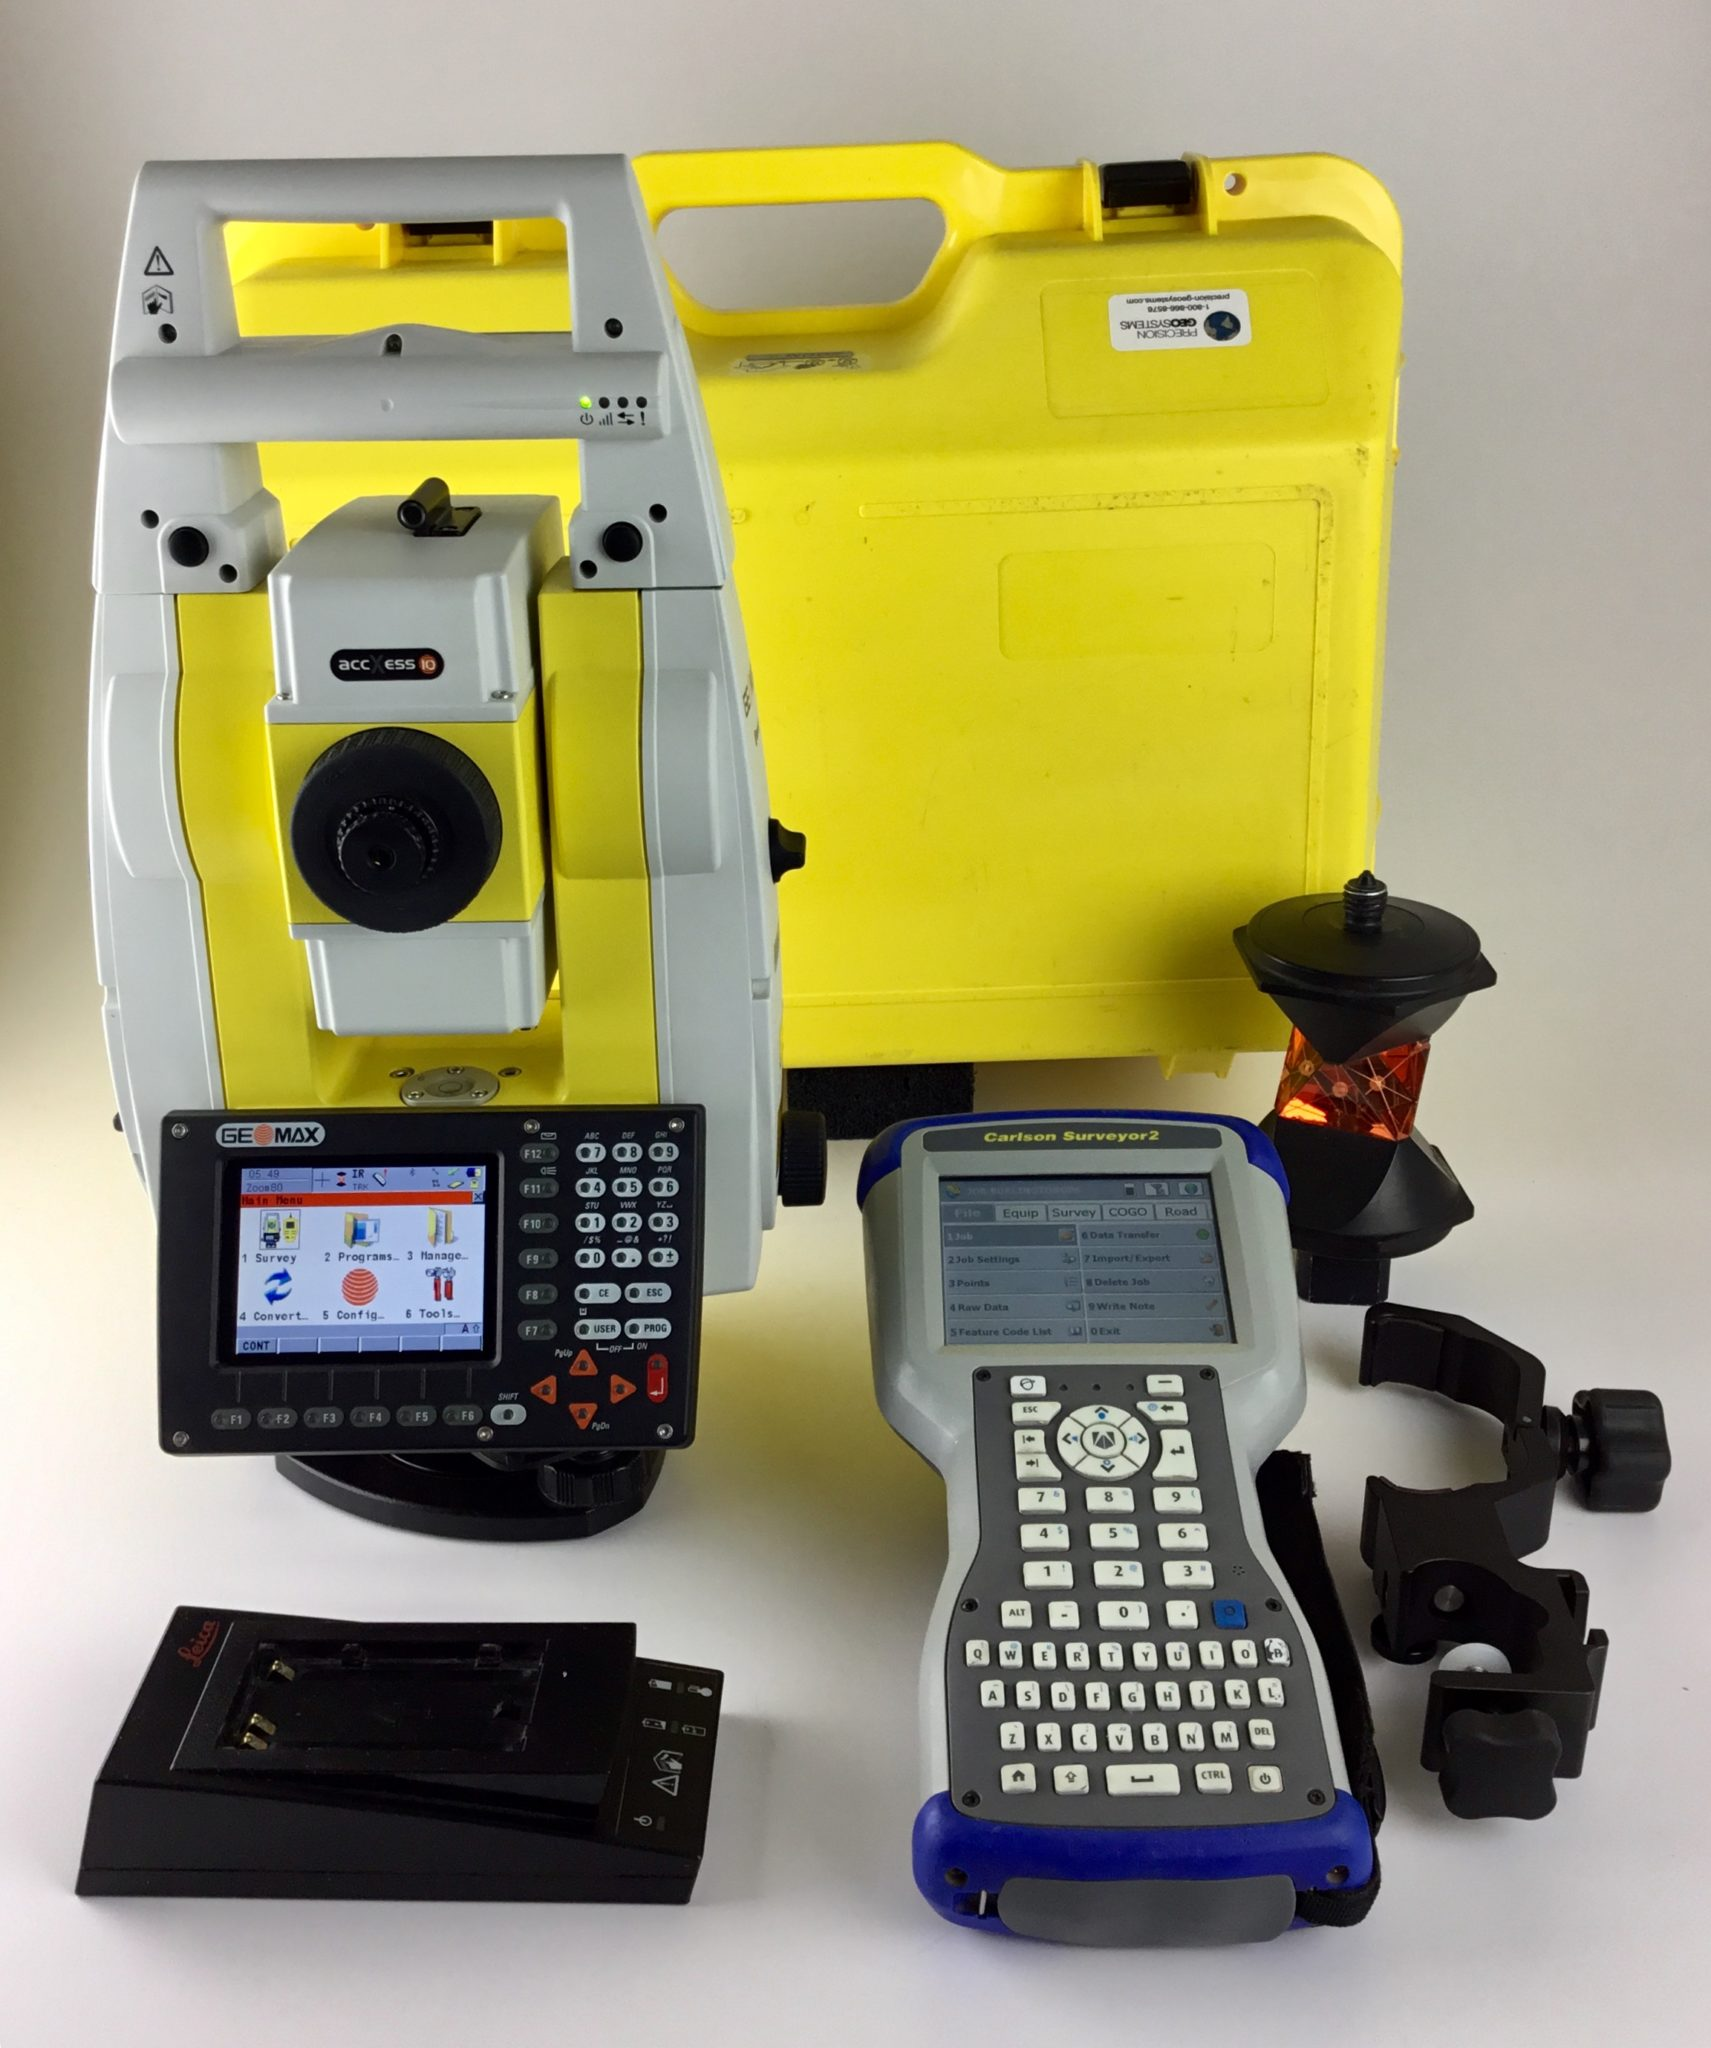 Geomax Zoom80 R 5 A10 Robotic Total Station Surveyor 2